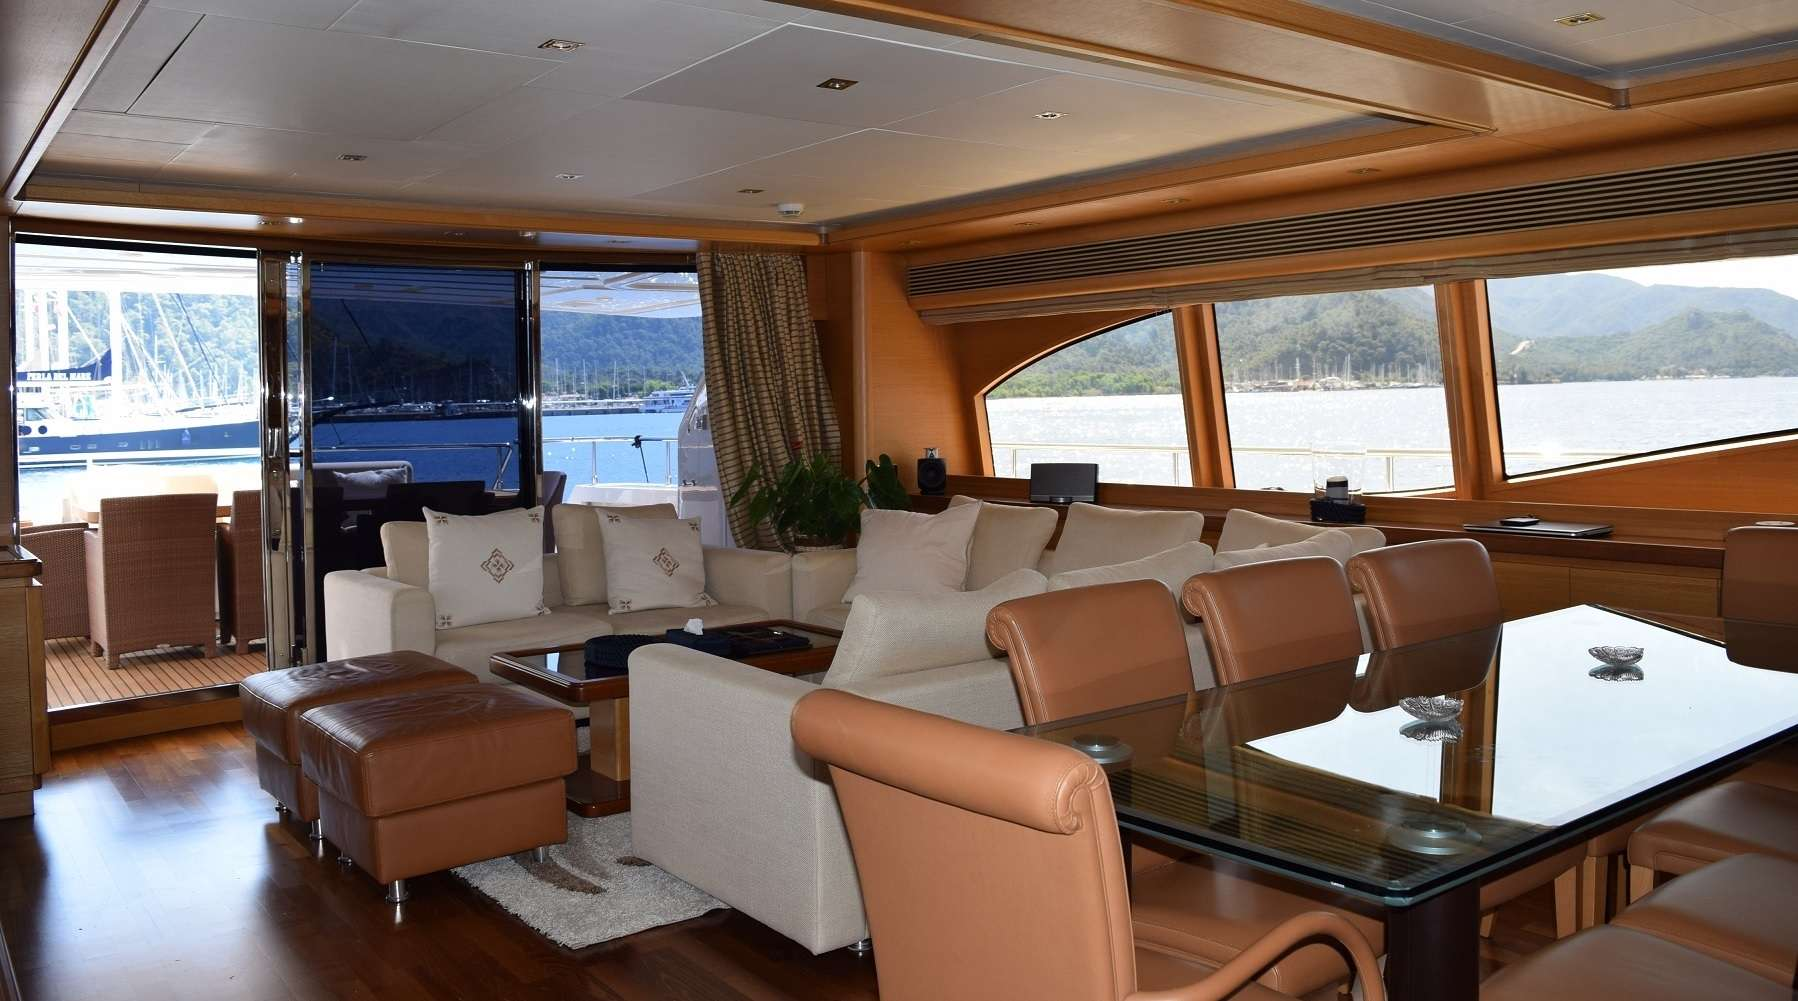 SEA LION II yacht image # 9